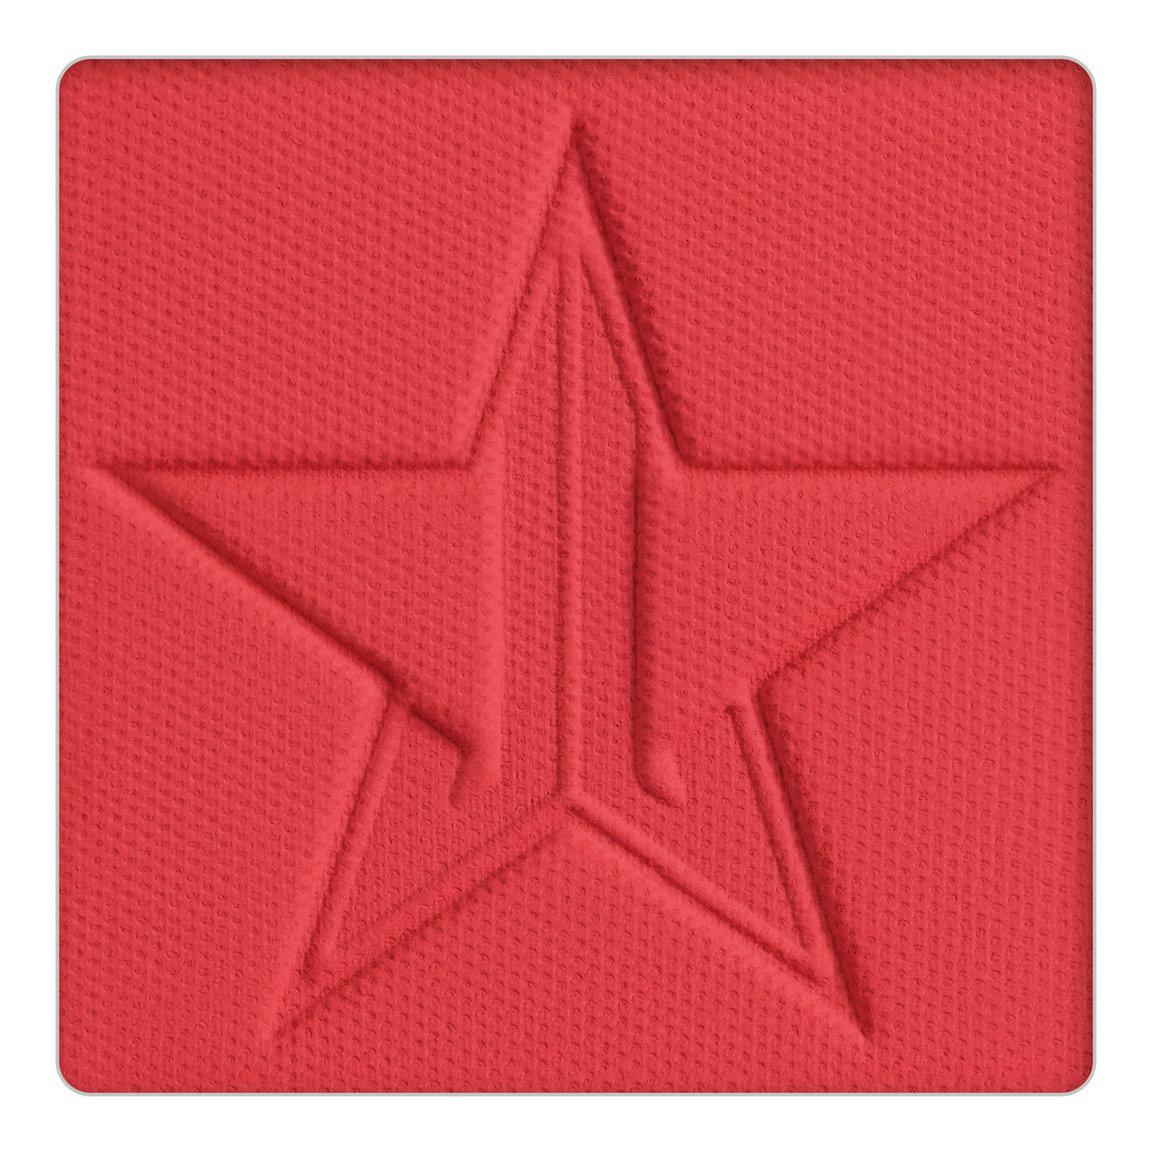 Jeffree Star Cosmetics Artistry Singles Prick alternative view 1.